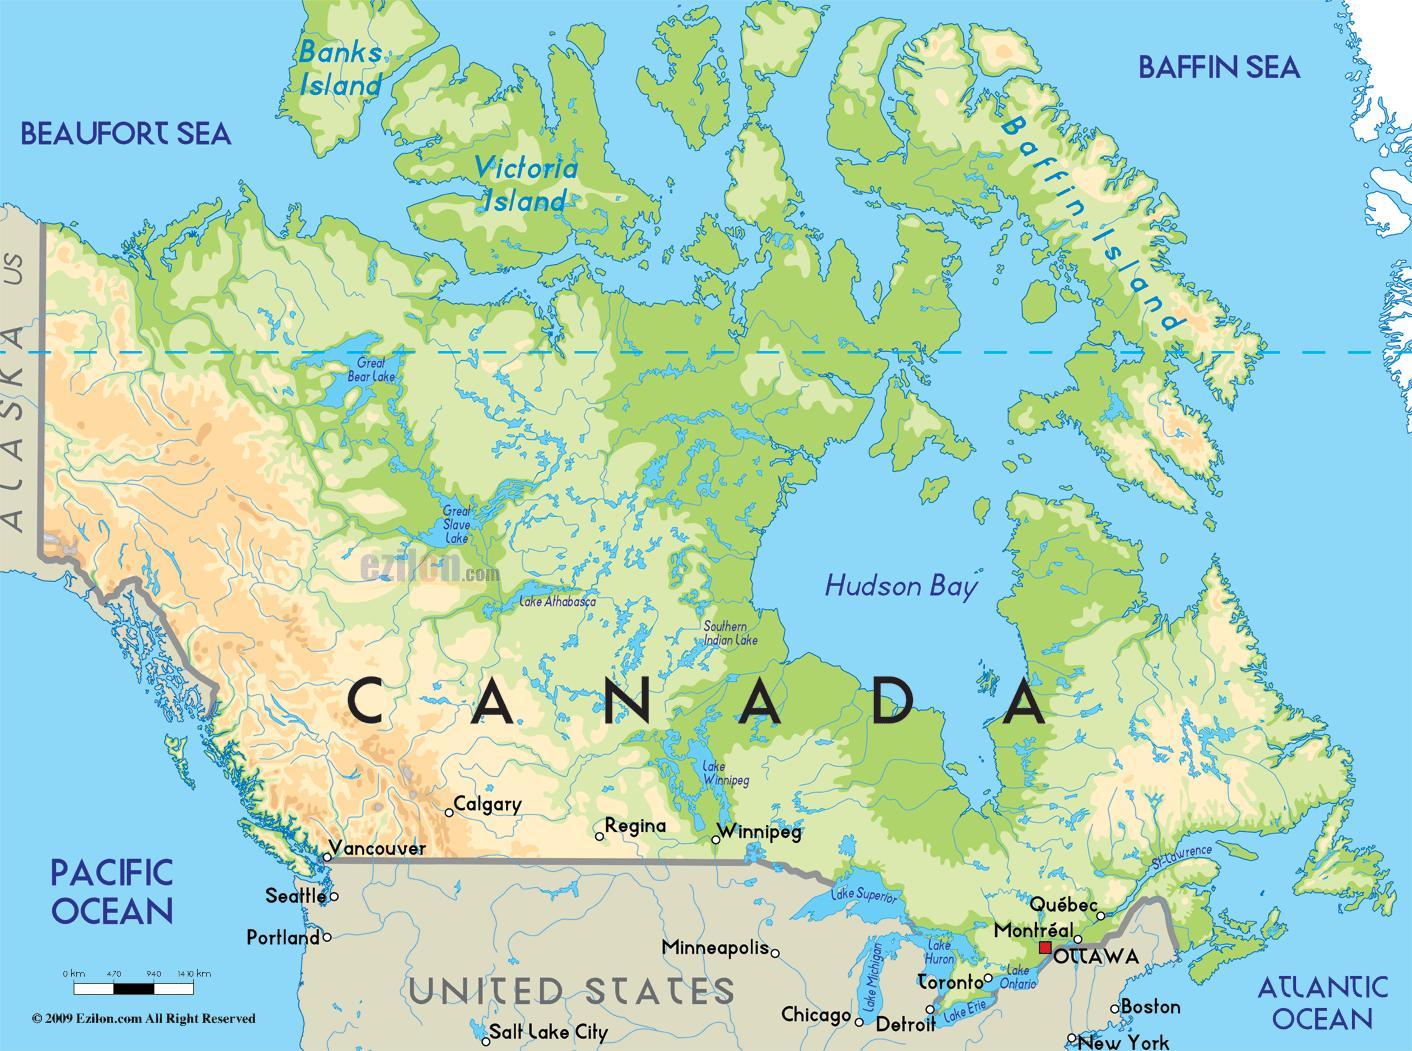 Canada Geografi Kort Kort Over Canada Geografi Det Nordlige